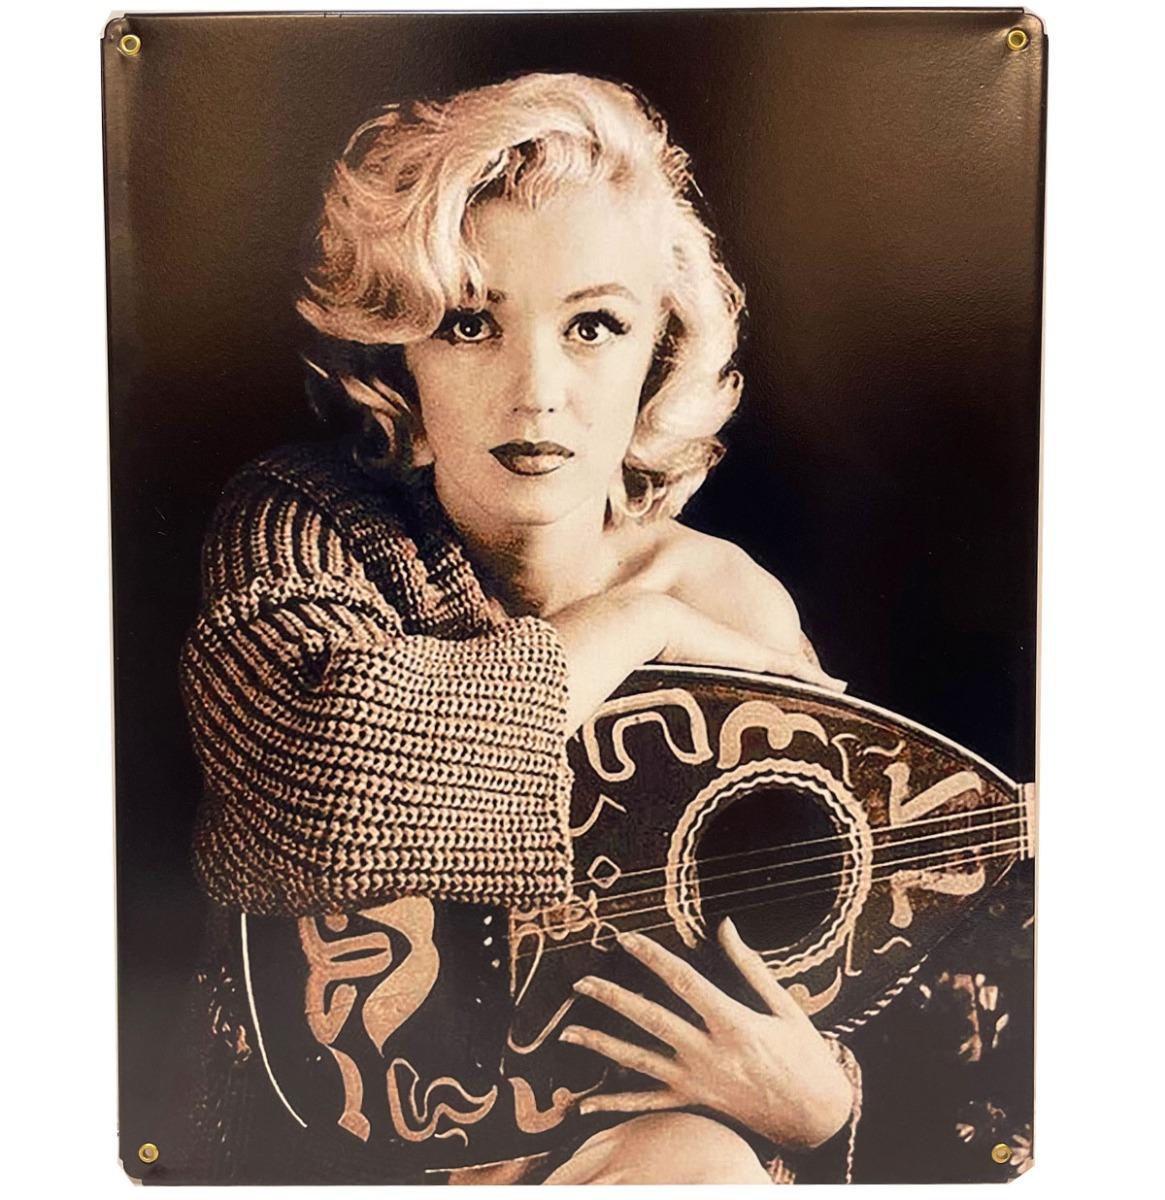 Marilyn Monroe Met Mandolin - Metalen Bord 29.5 x 37 cm